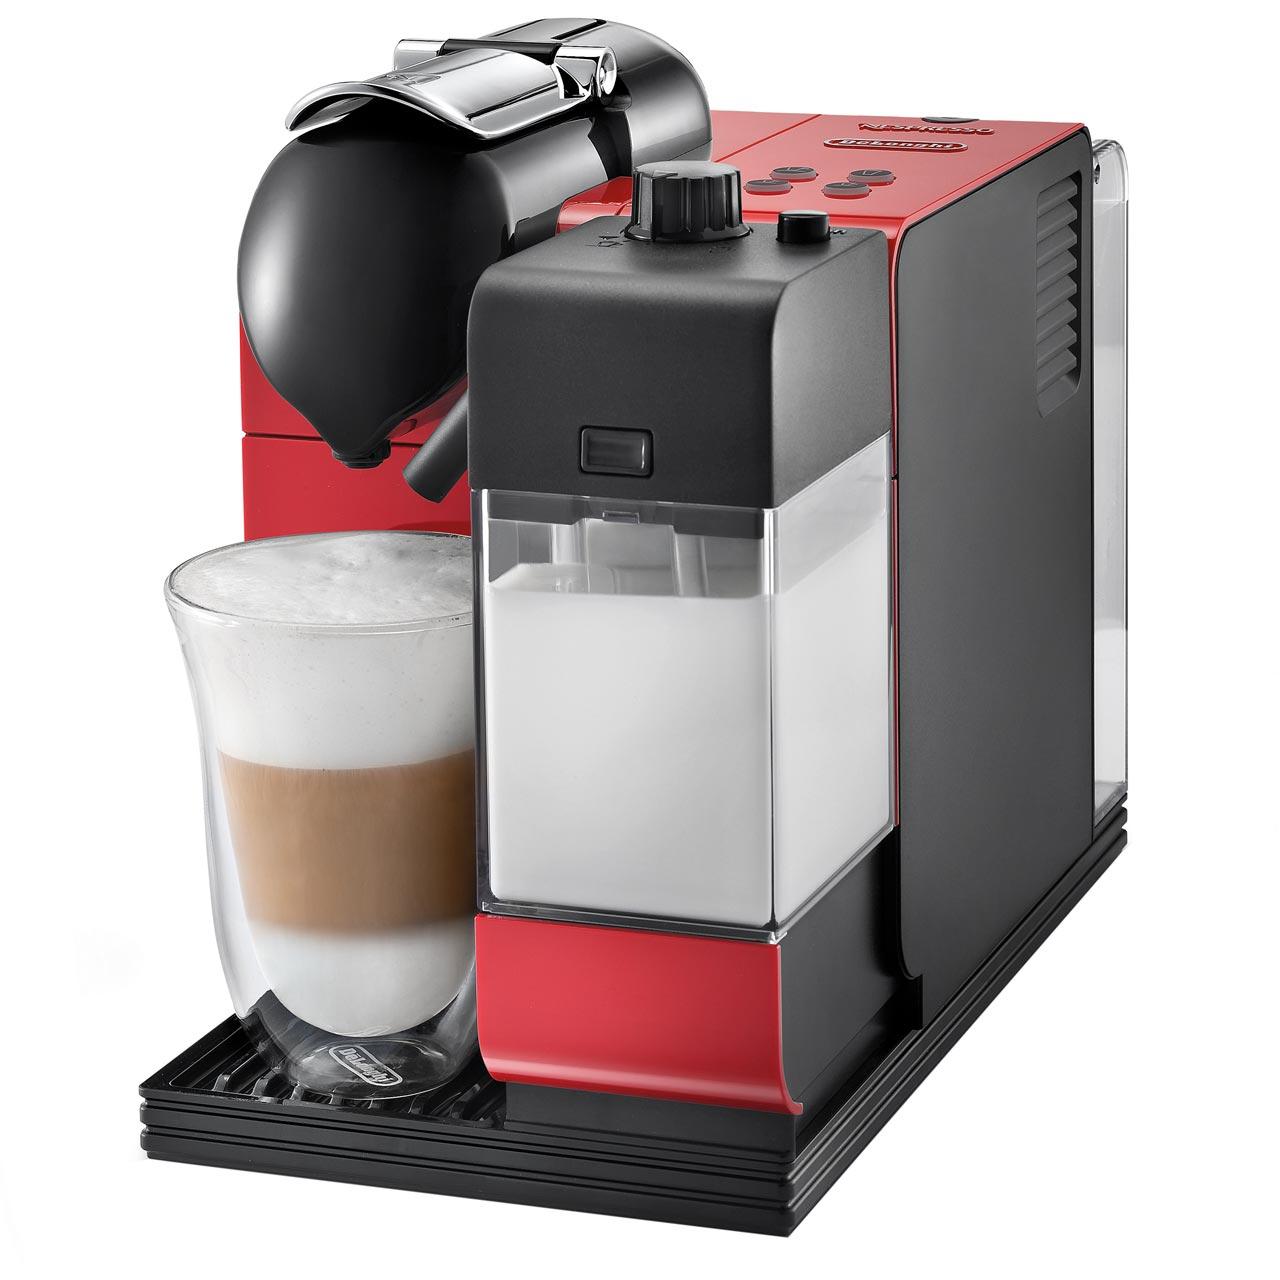 http://media.ao.com/en-GB/Productimages/Images/rvLarge/en521r_rd_delonghi_nespresso_01_l.jpg